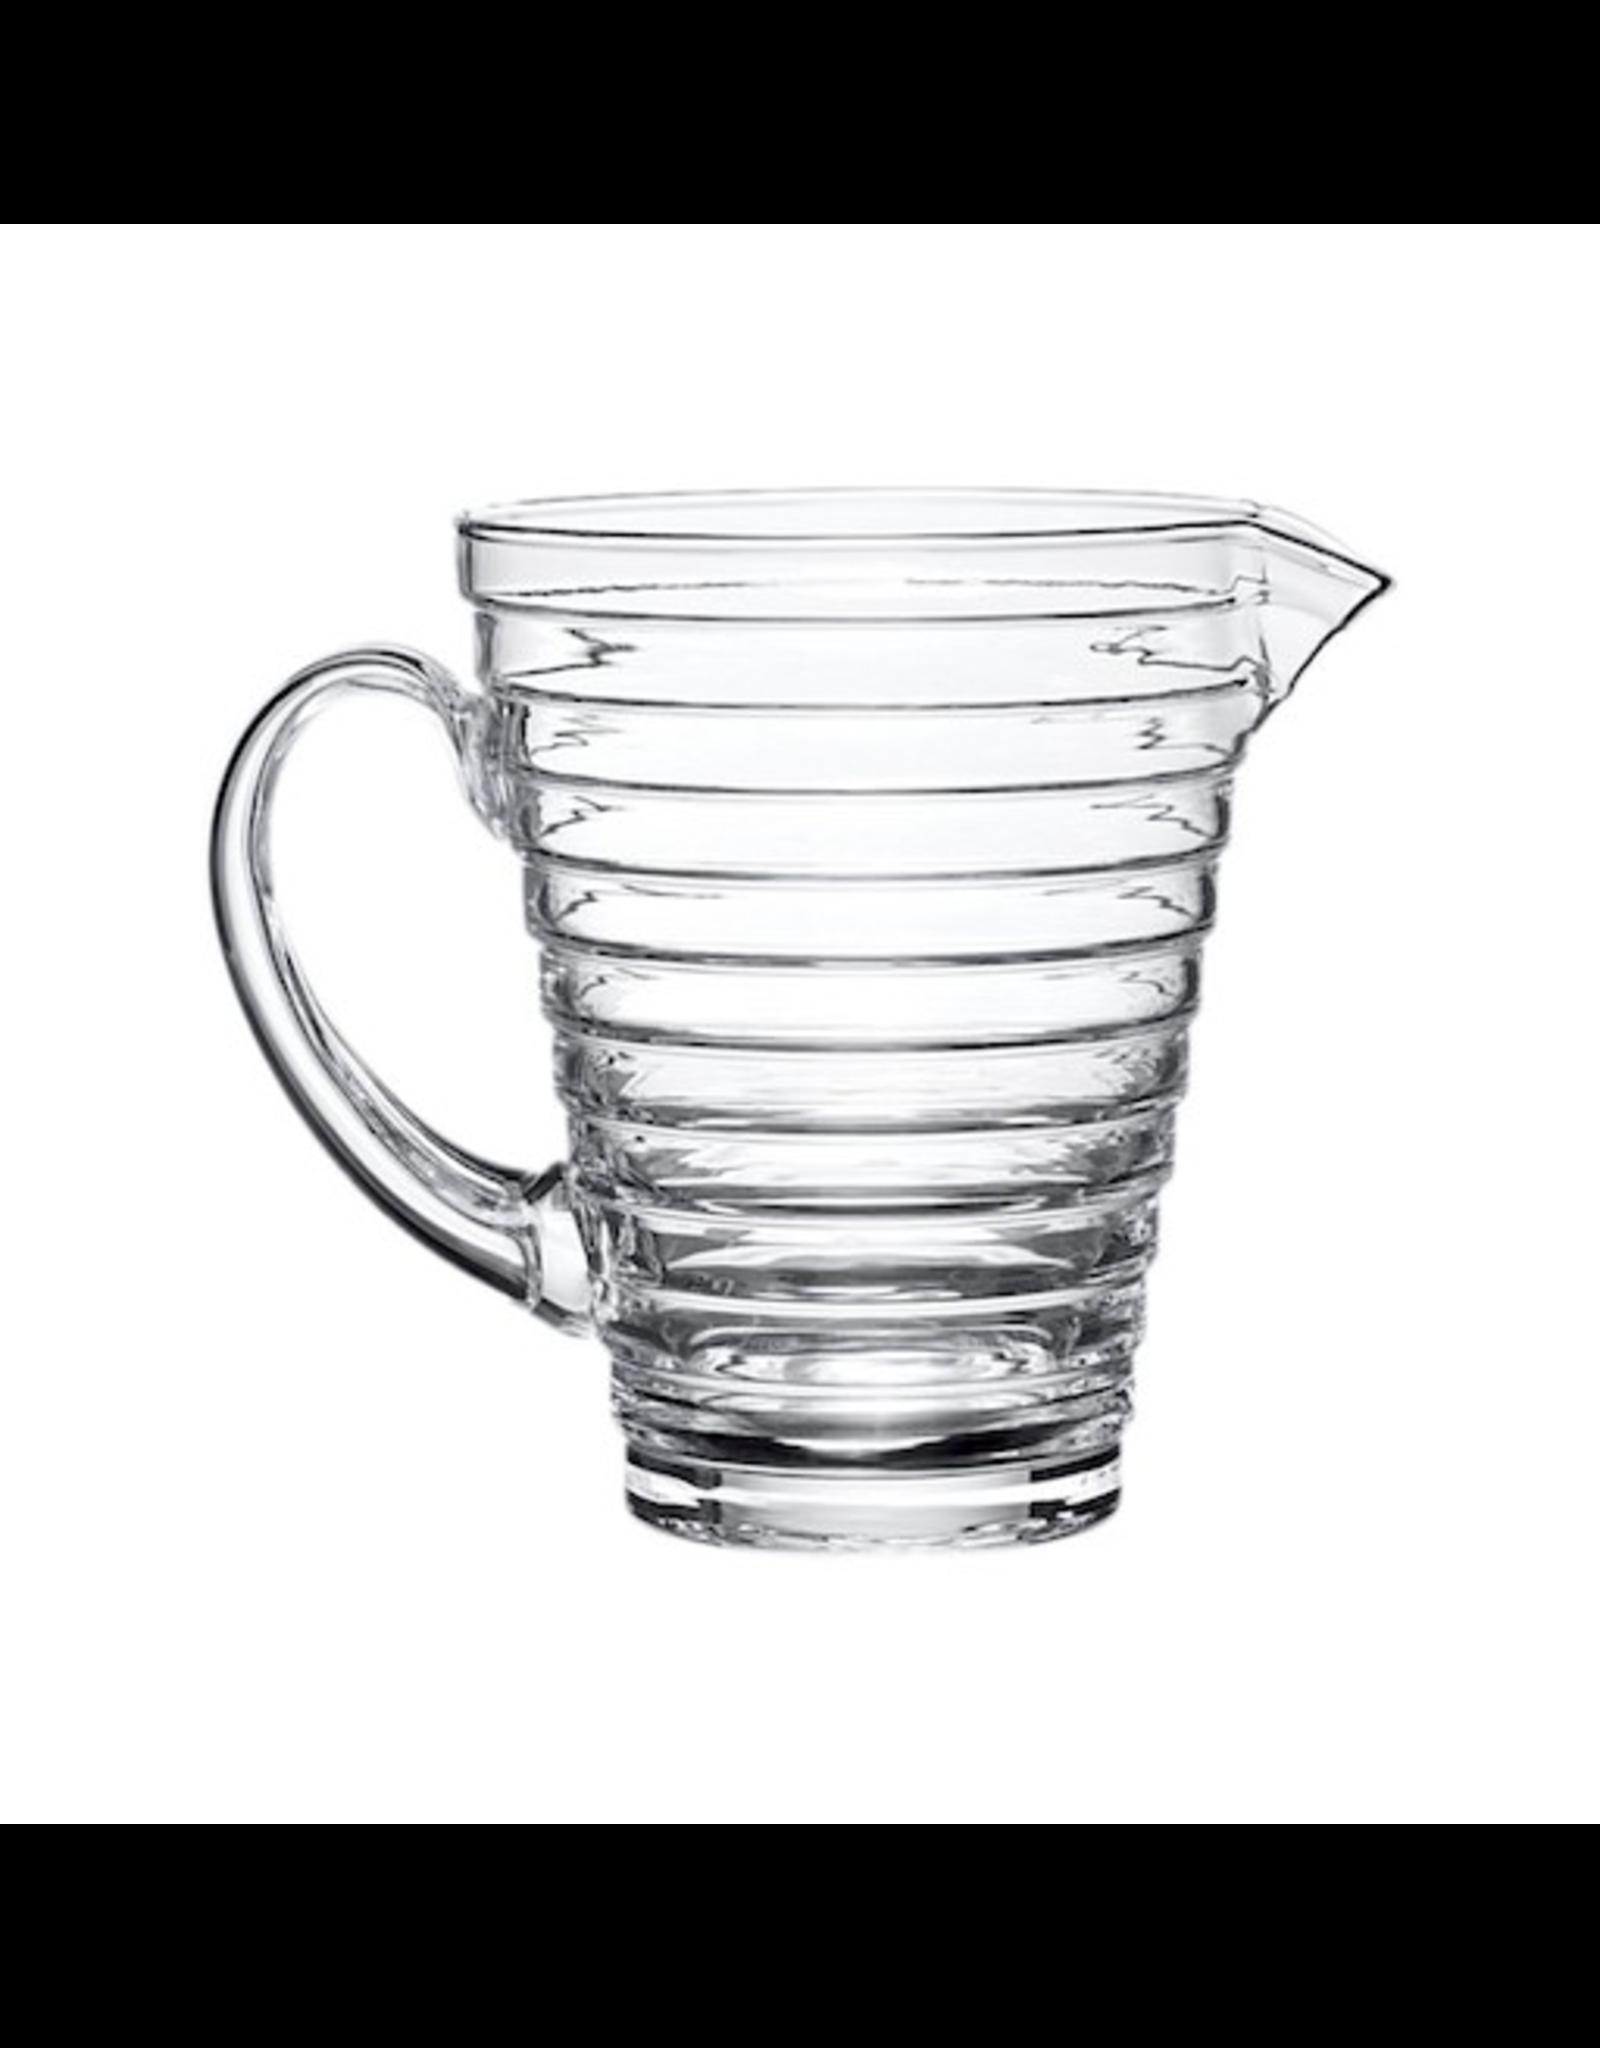 IITTALA AINO AALTO 透明水壶 120 CL